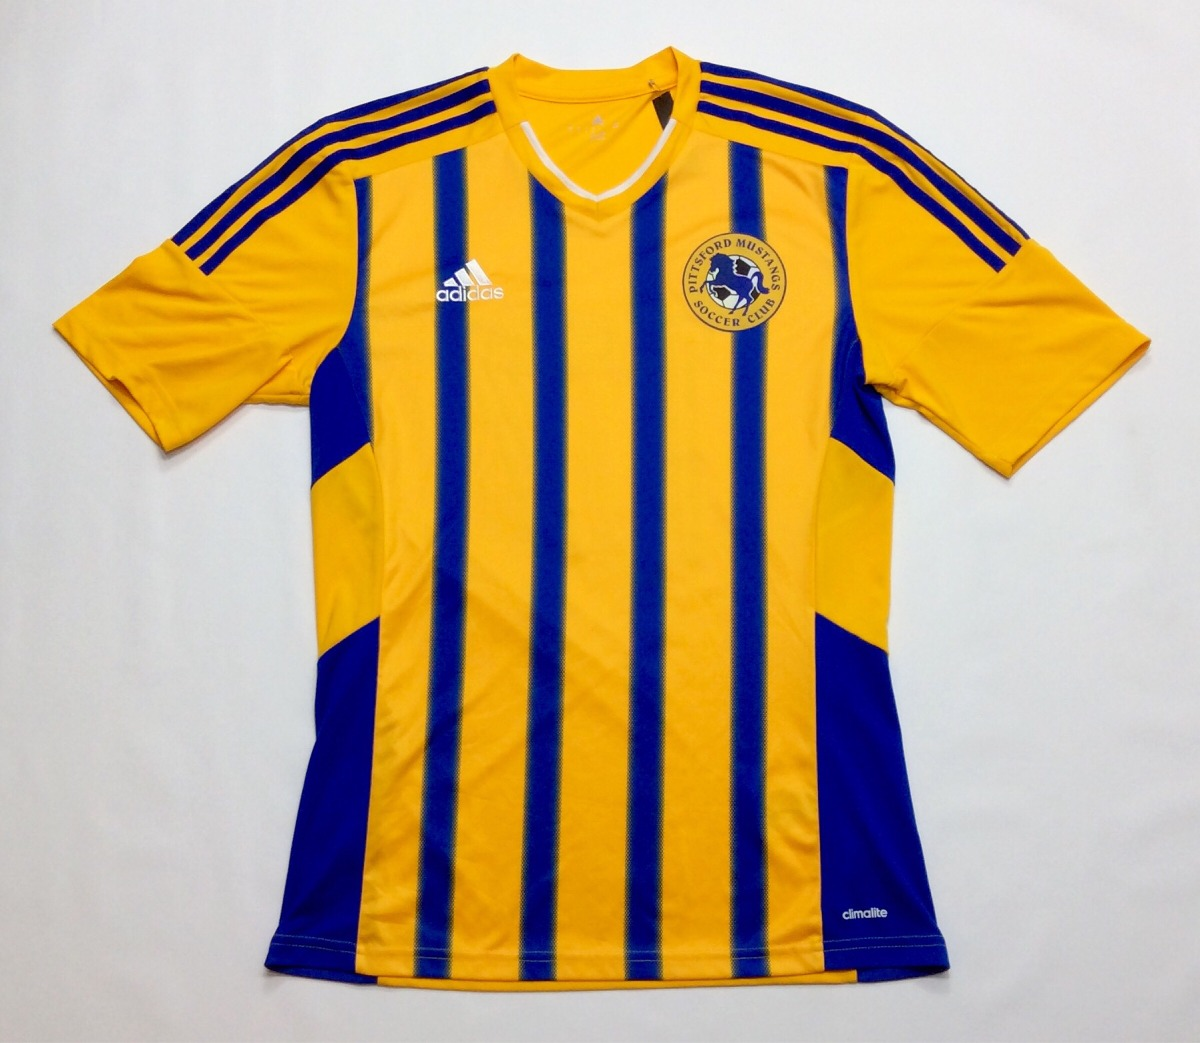 camiseta futbol adidas climalite pittsford mustangs 17 s. Cargando zoom. 93abaf8a4646e